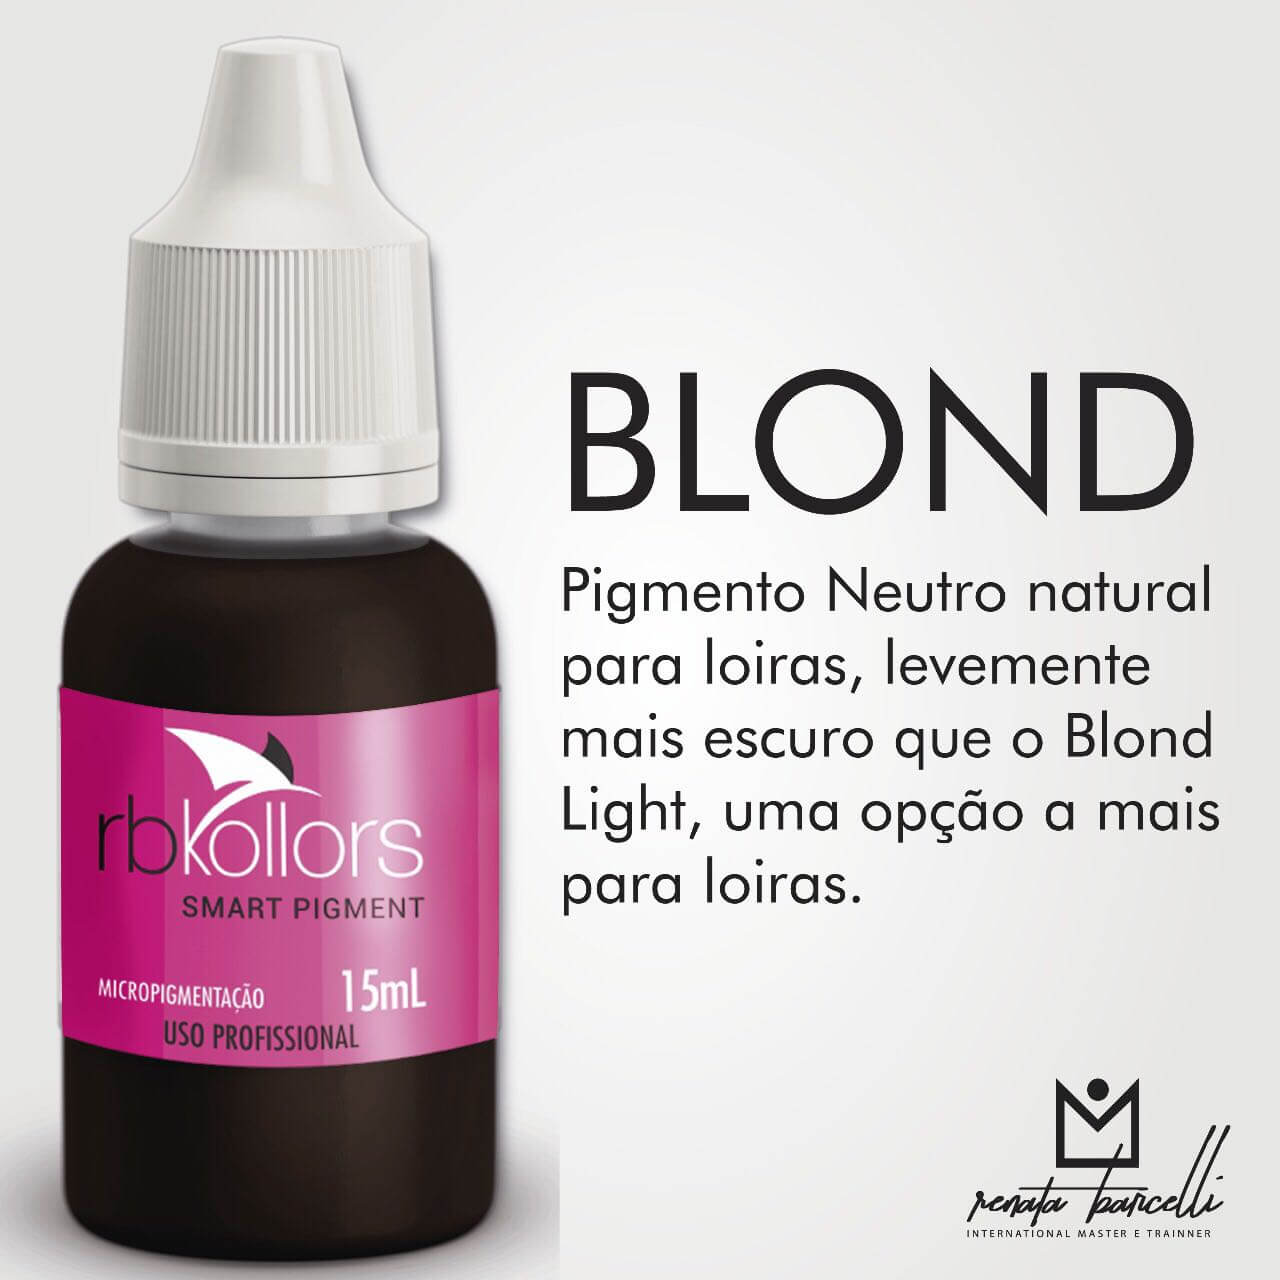 Pigmento RB Kollors Blond